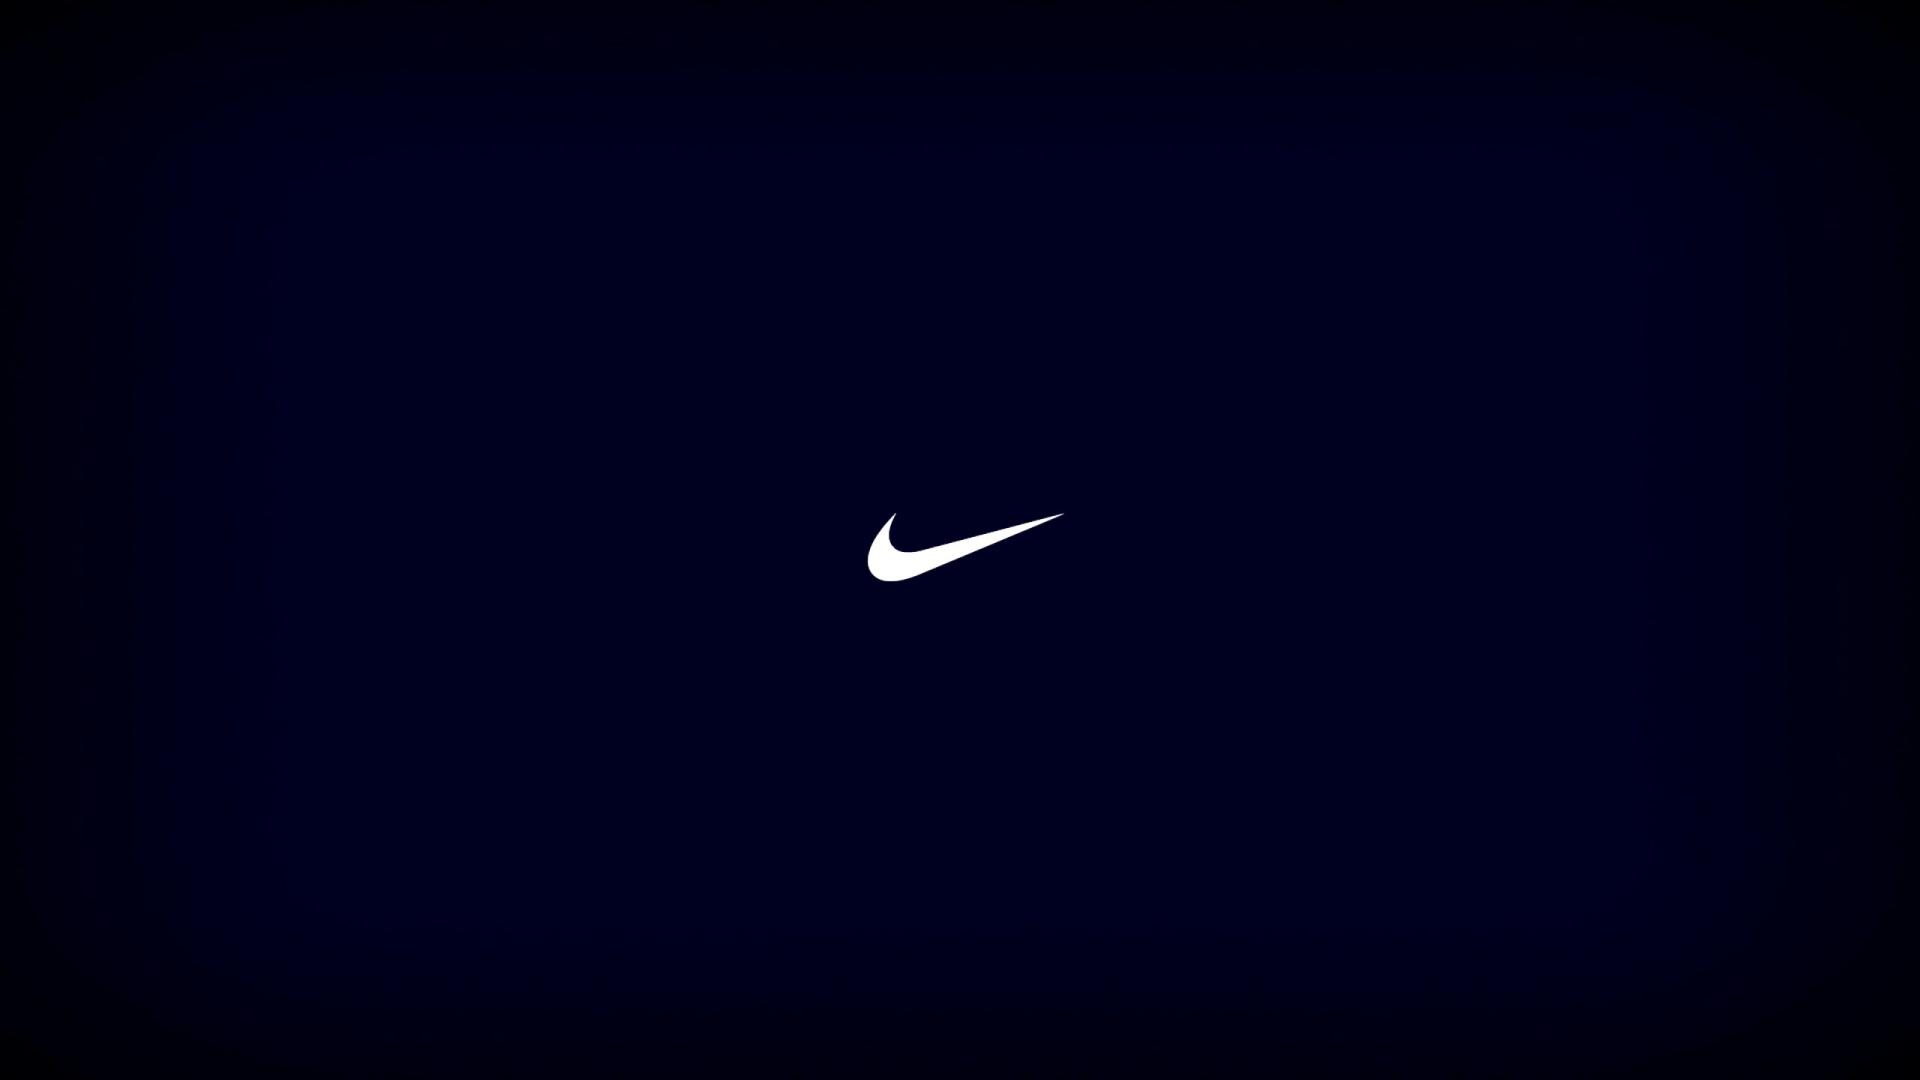 Nike Basketball Logo Wallpaper HD 11848 Wallpaper High Resolution 1920x1080